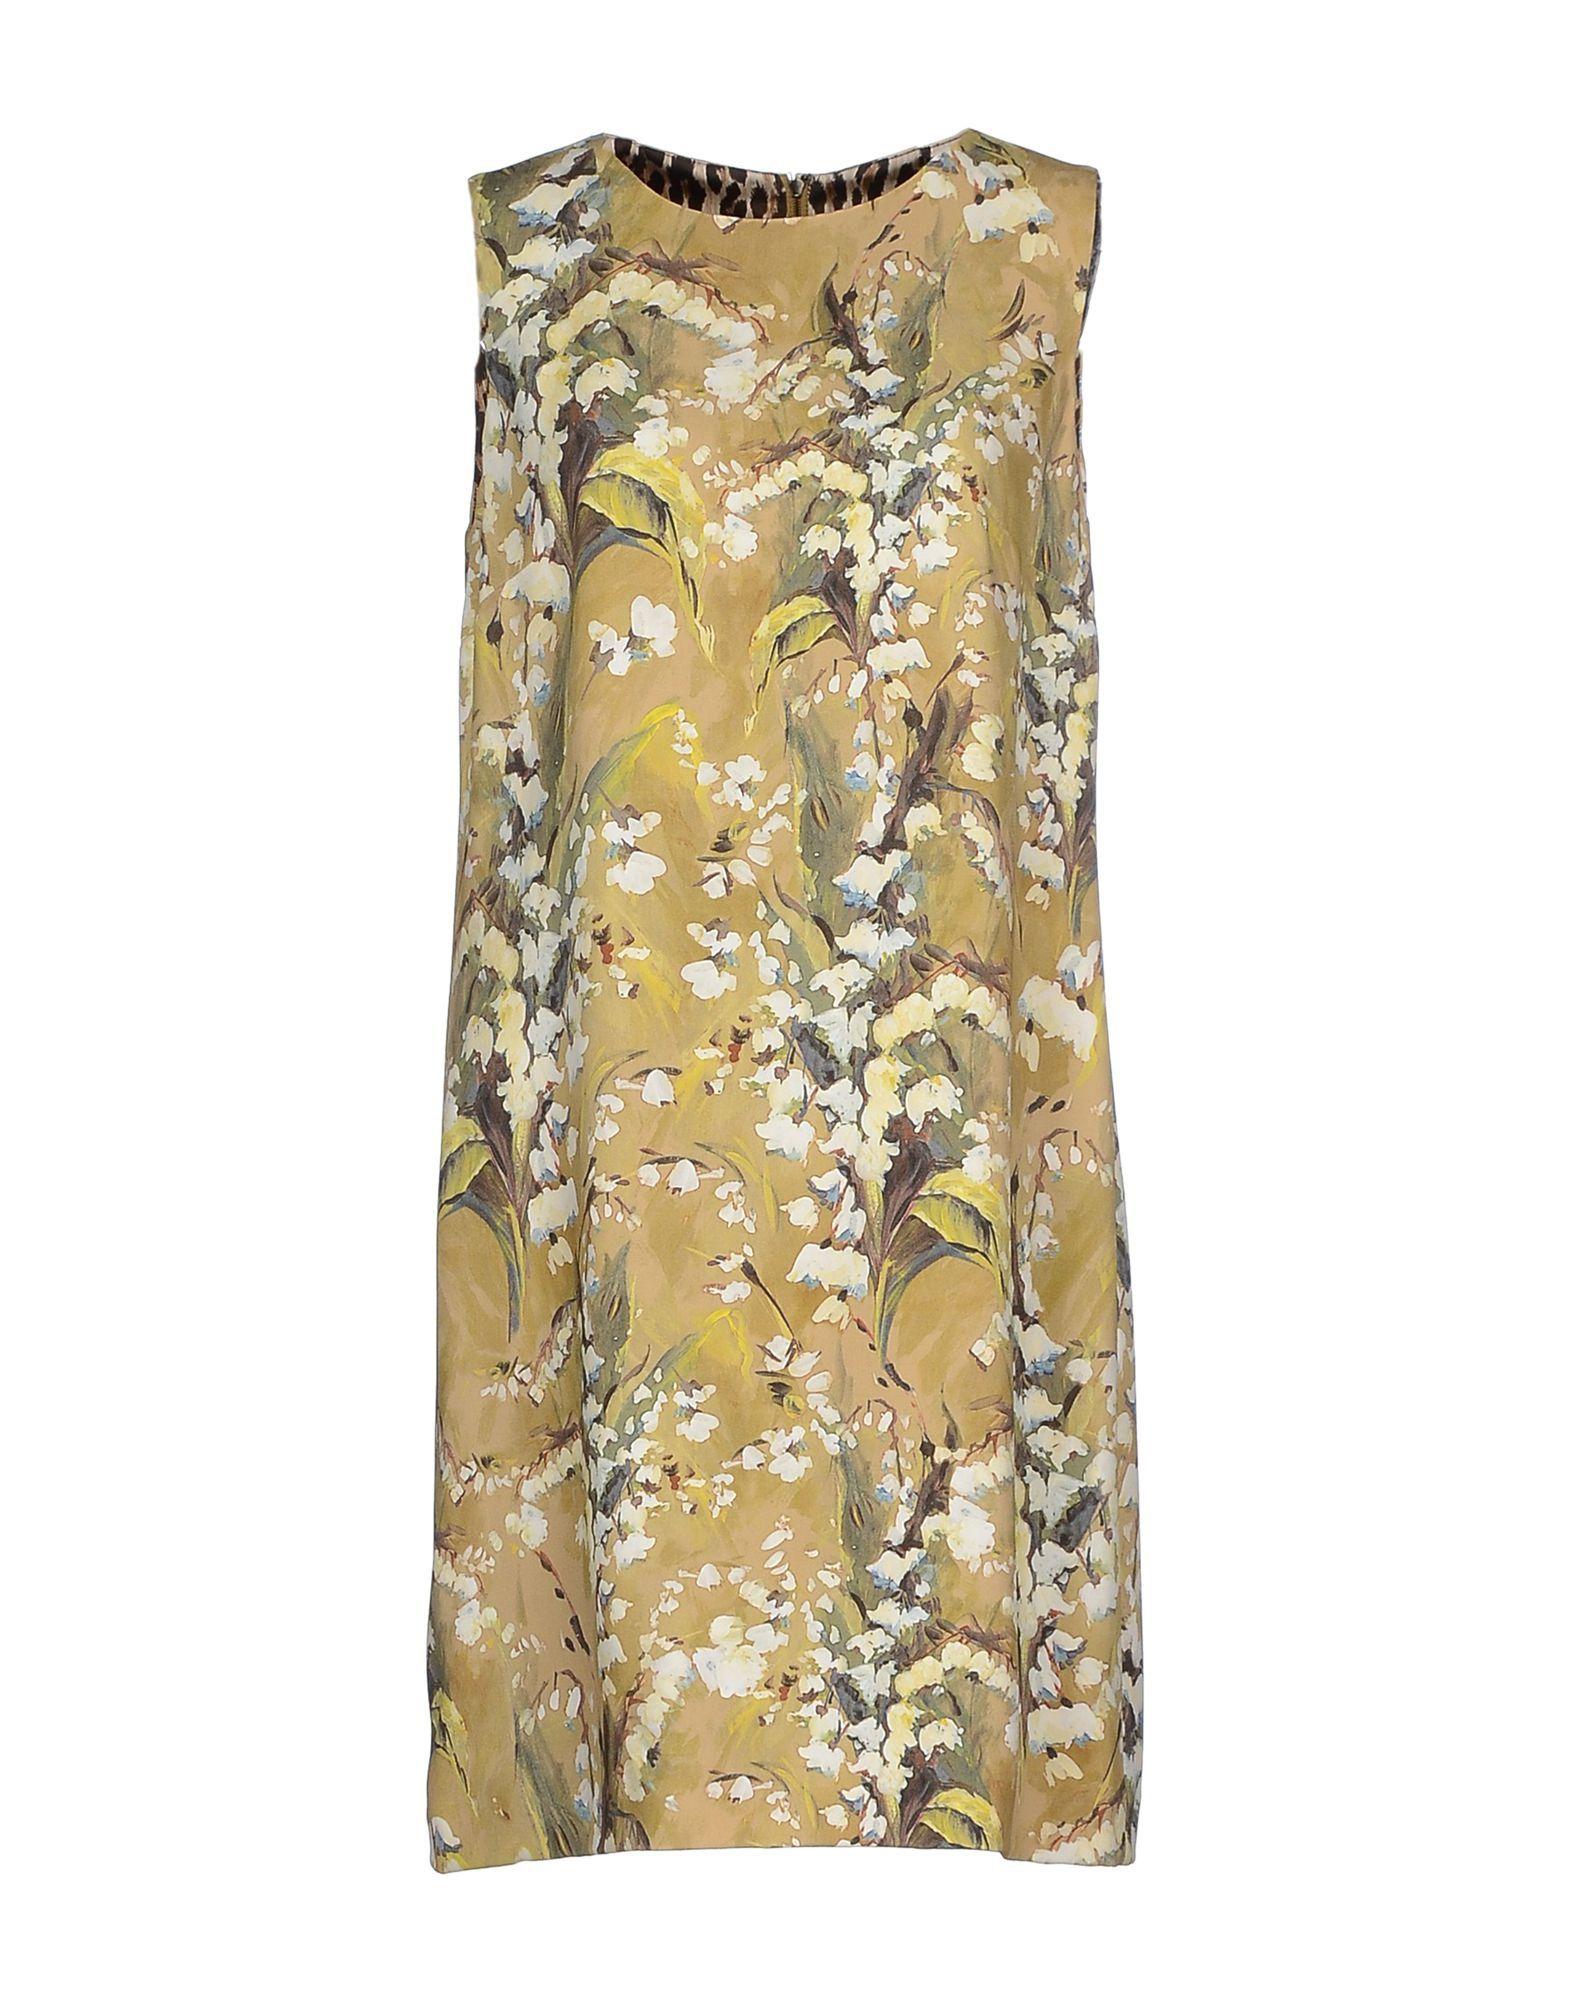 Dolce & Gabbana Sand Floral Design Sleeveless Dress